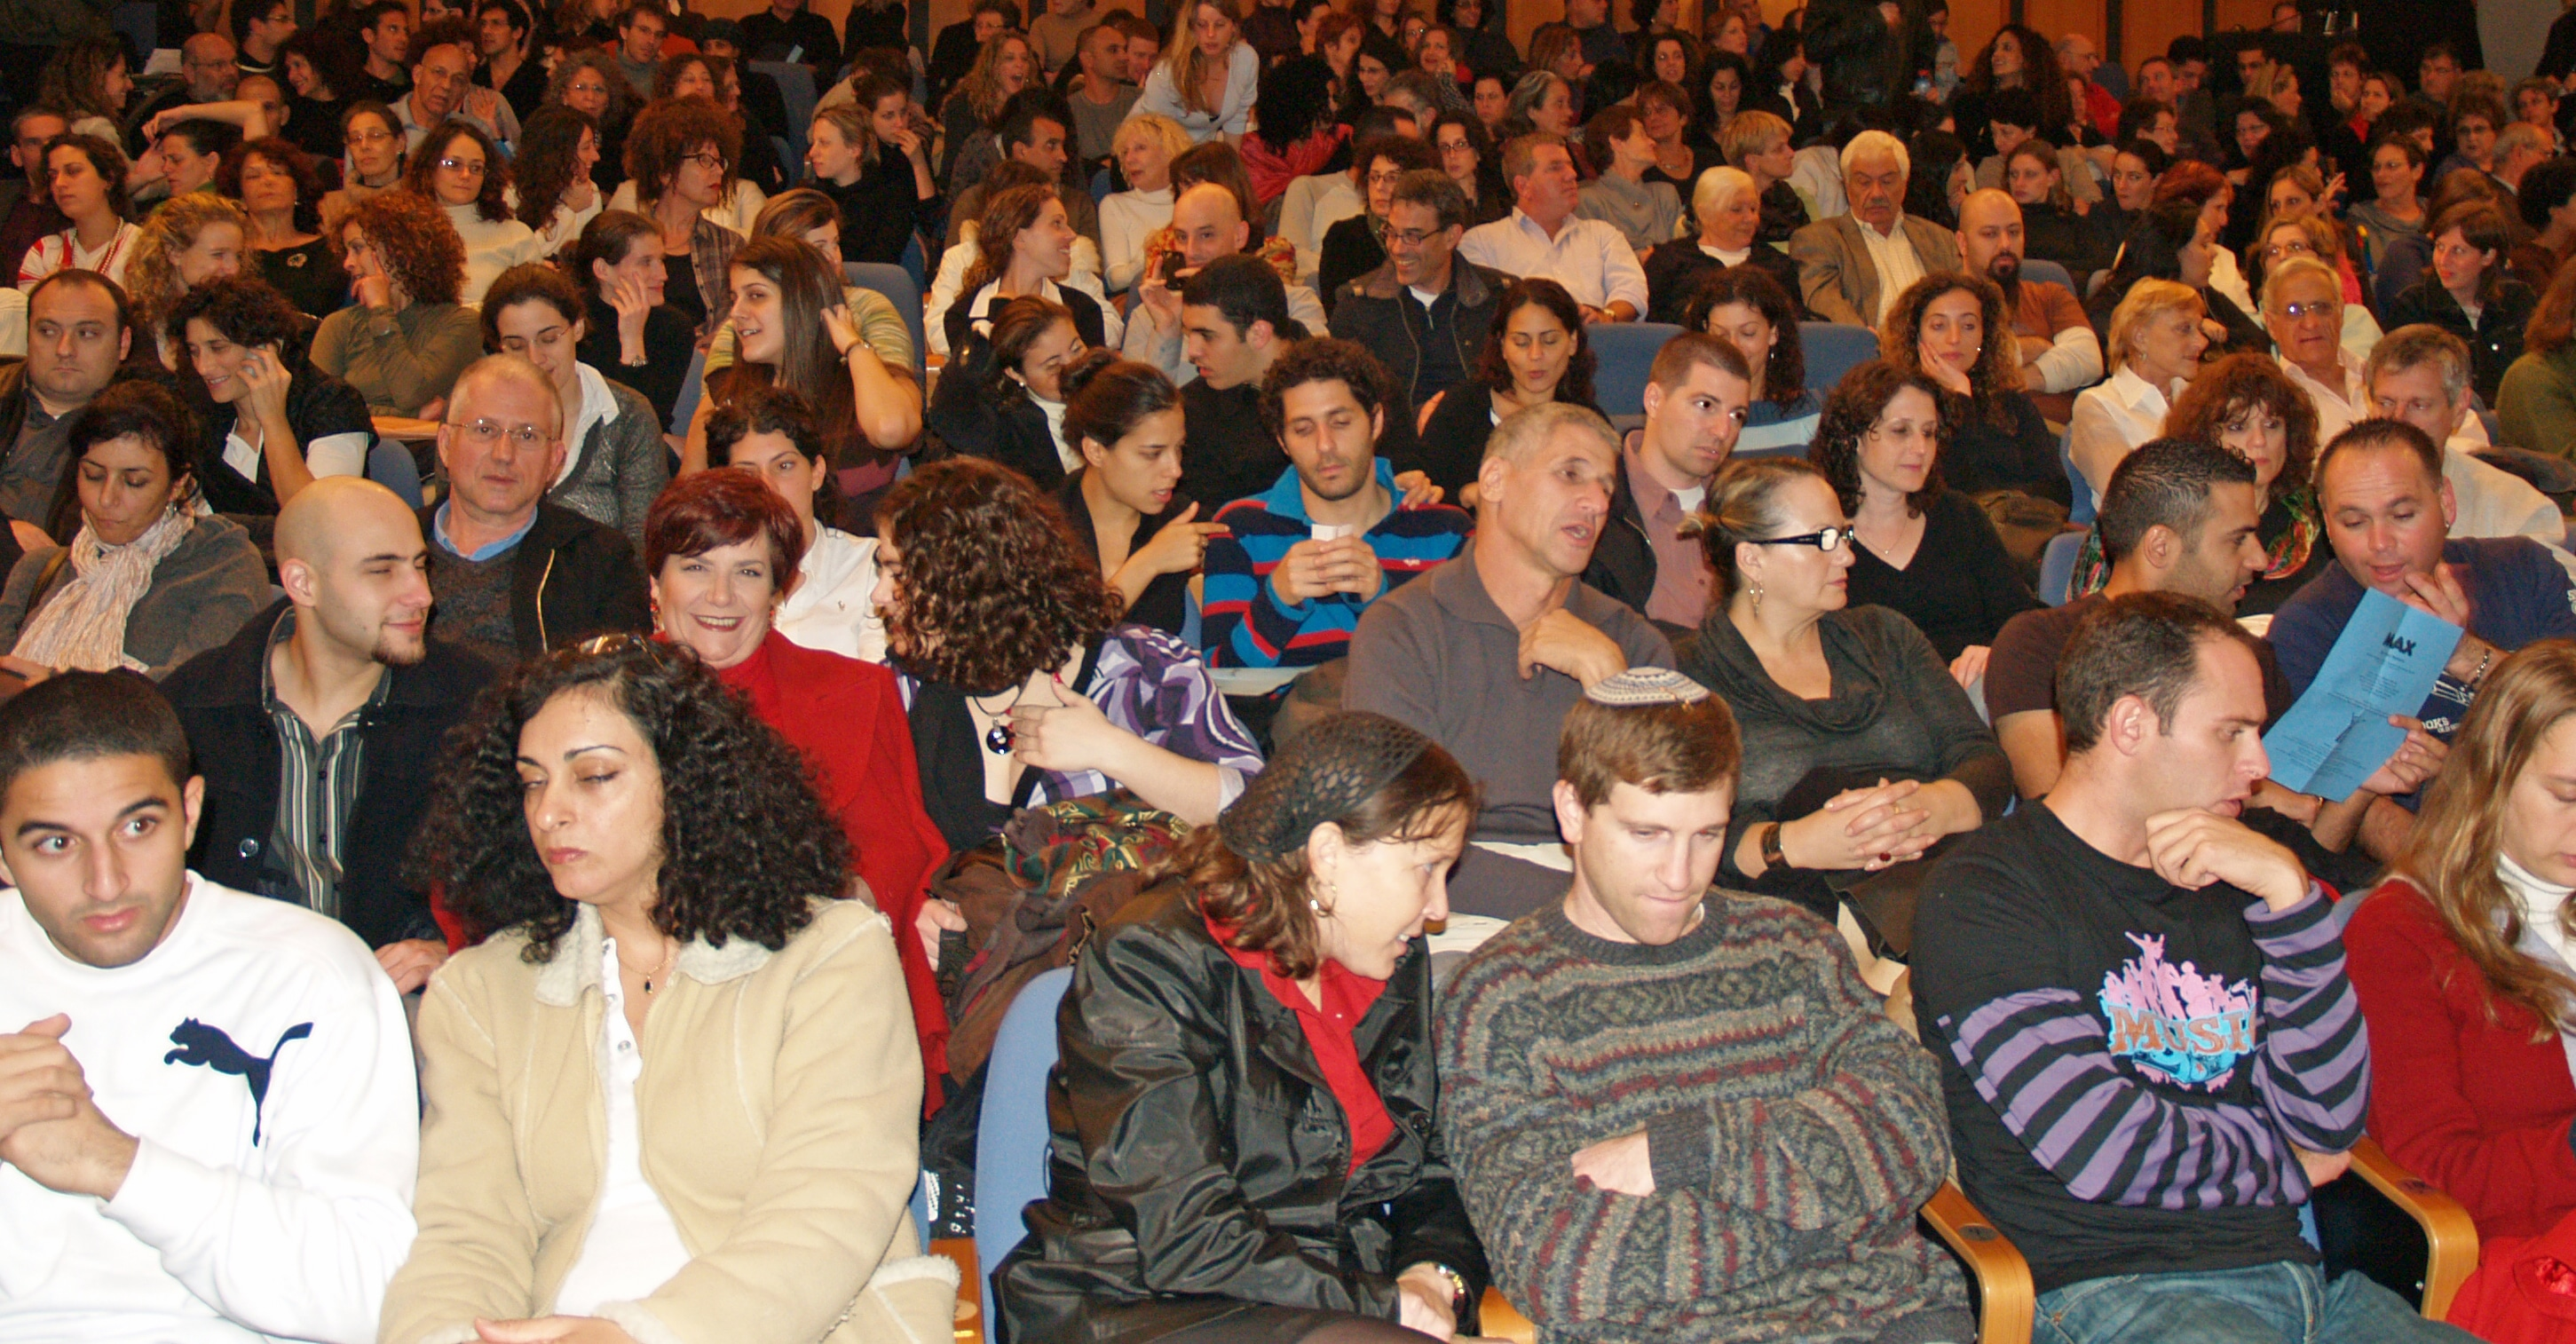 Image Batsheva_theater_crowd_in_Tel_Aviv_by_David_Shankbone.jpg of Whаt Iѕ E-Cоmmеrсе ?